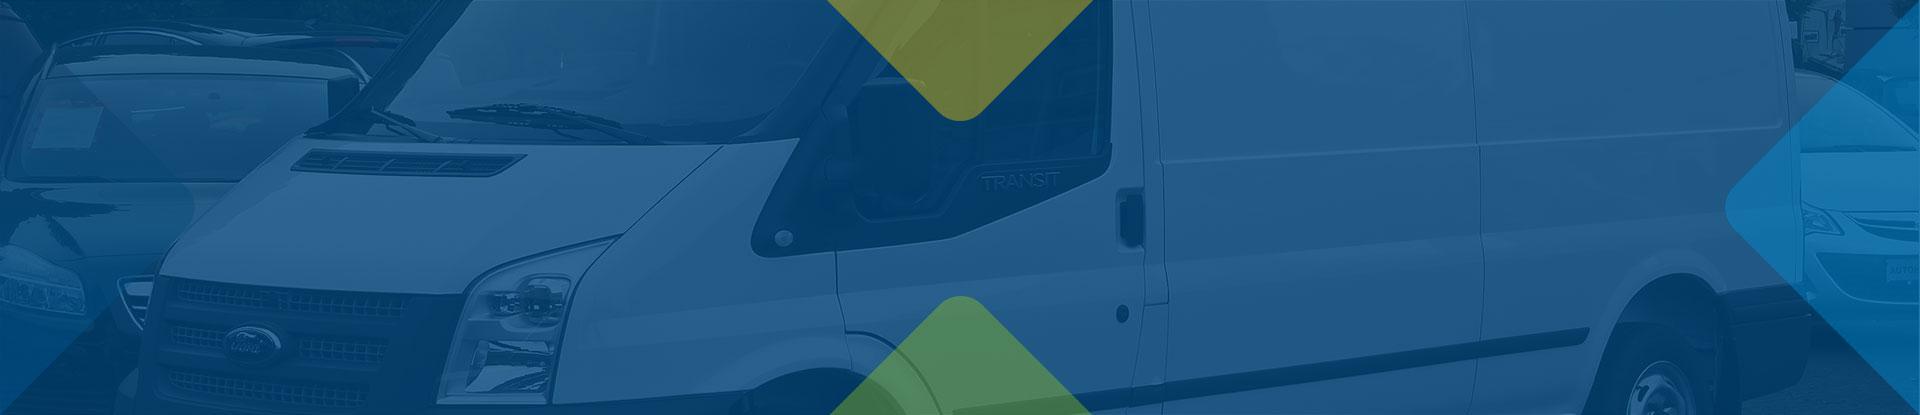 SynX Banner Walkaround Checks and Compliance